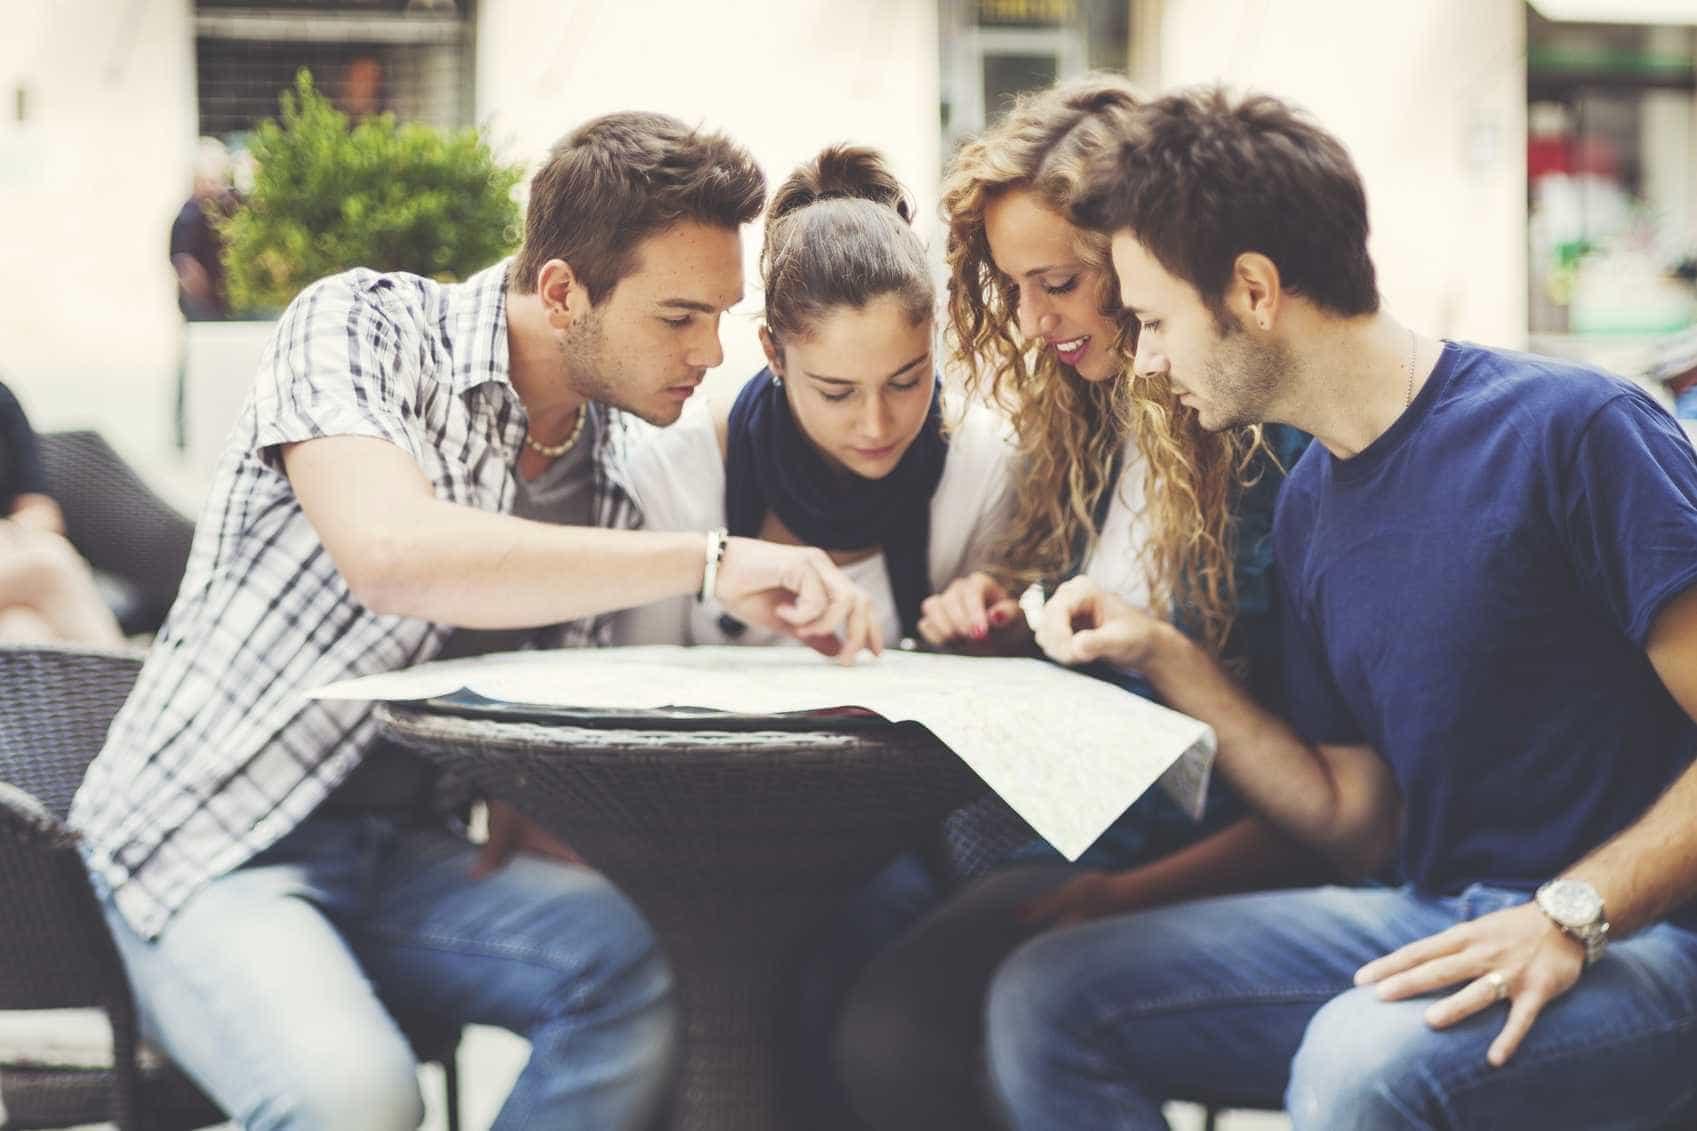 Medo de estudar em Inglaterra após Brexit? Empresa ajuda alunos